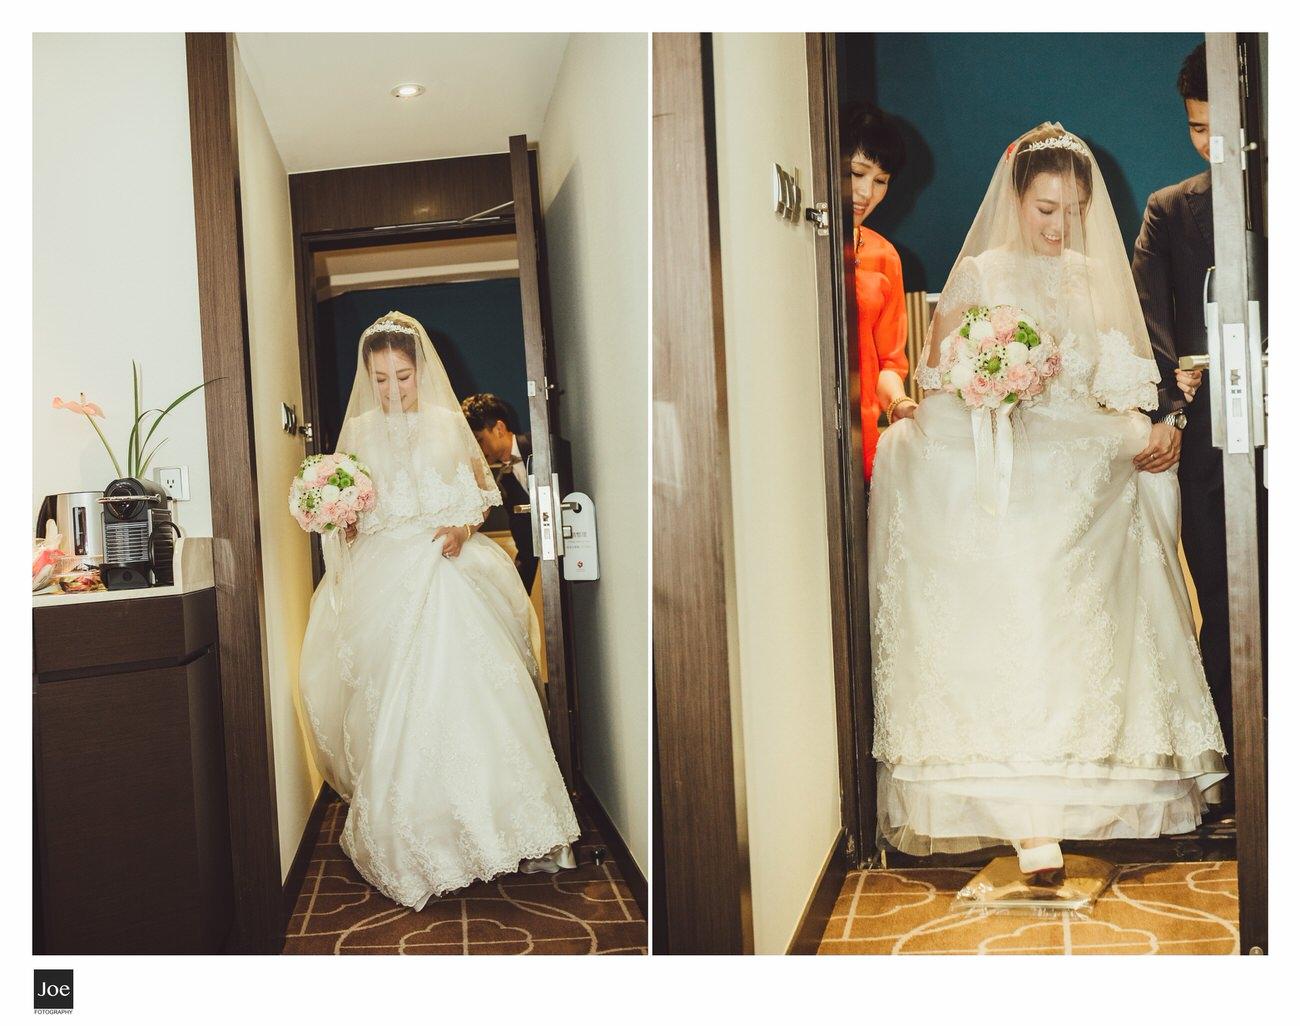 sunworld-dynasty-hotel-taipei-wedding-photo-joe-fotography-angel-jay-052.jpg